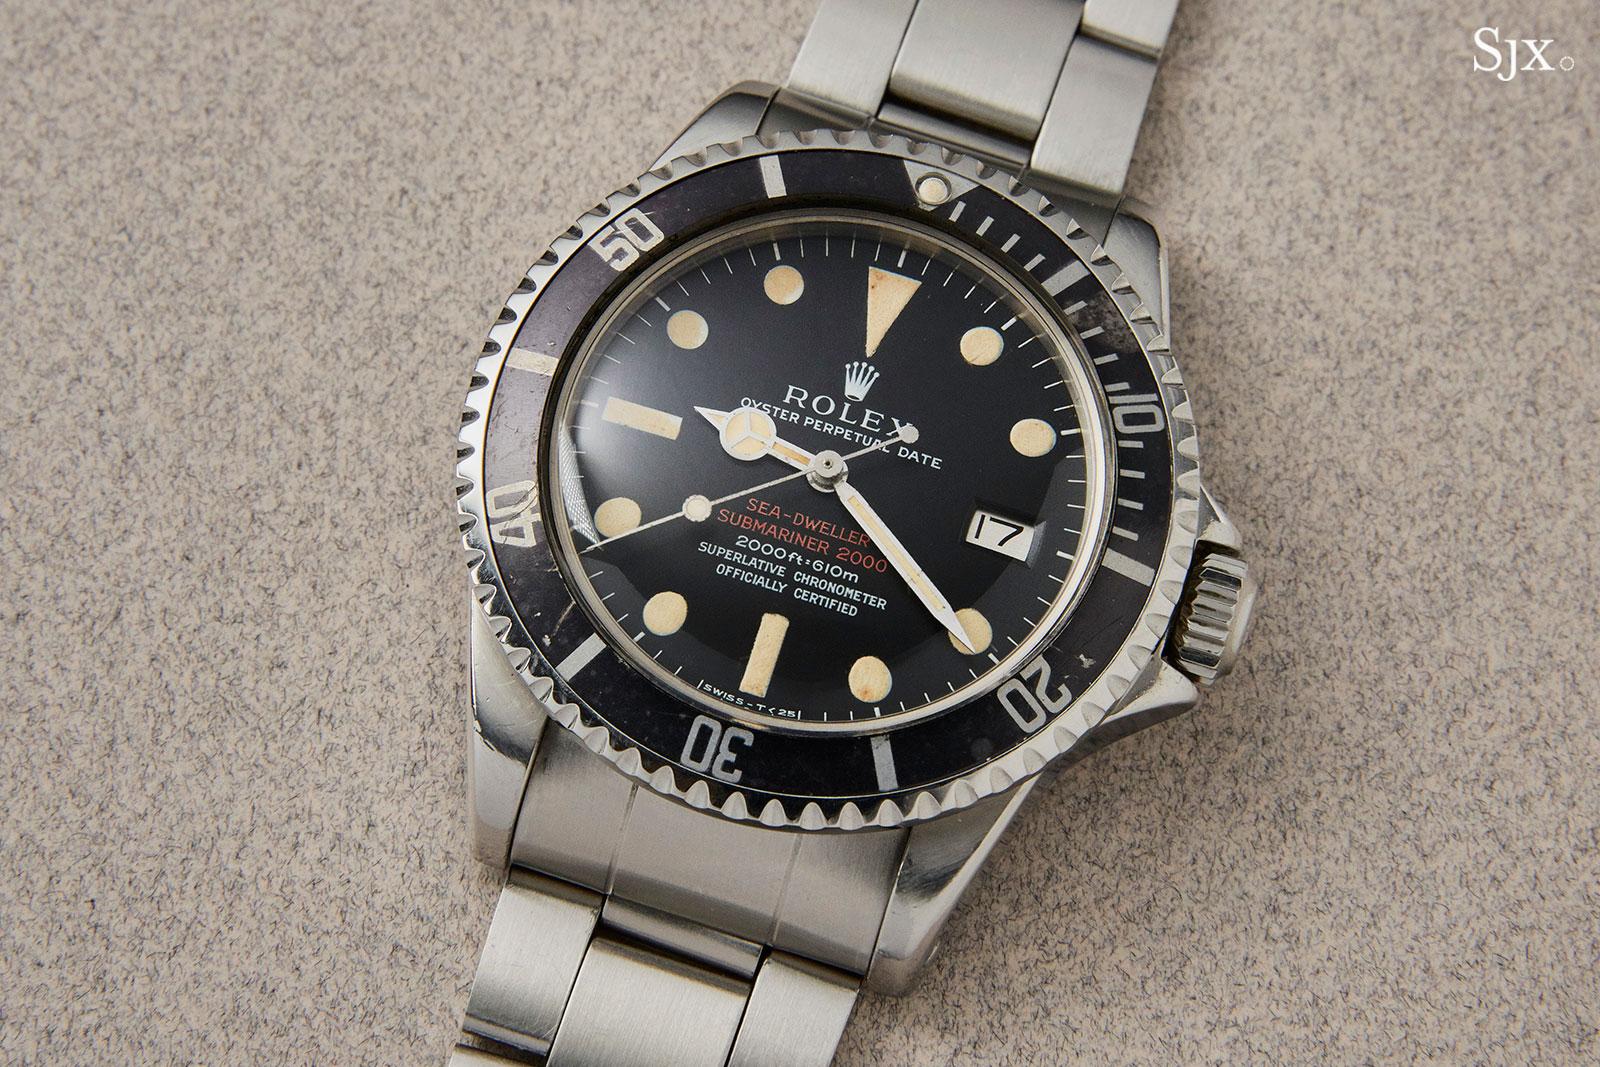 Rolex Sea-Dweller 1665 no escape valve 1